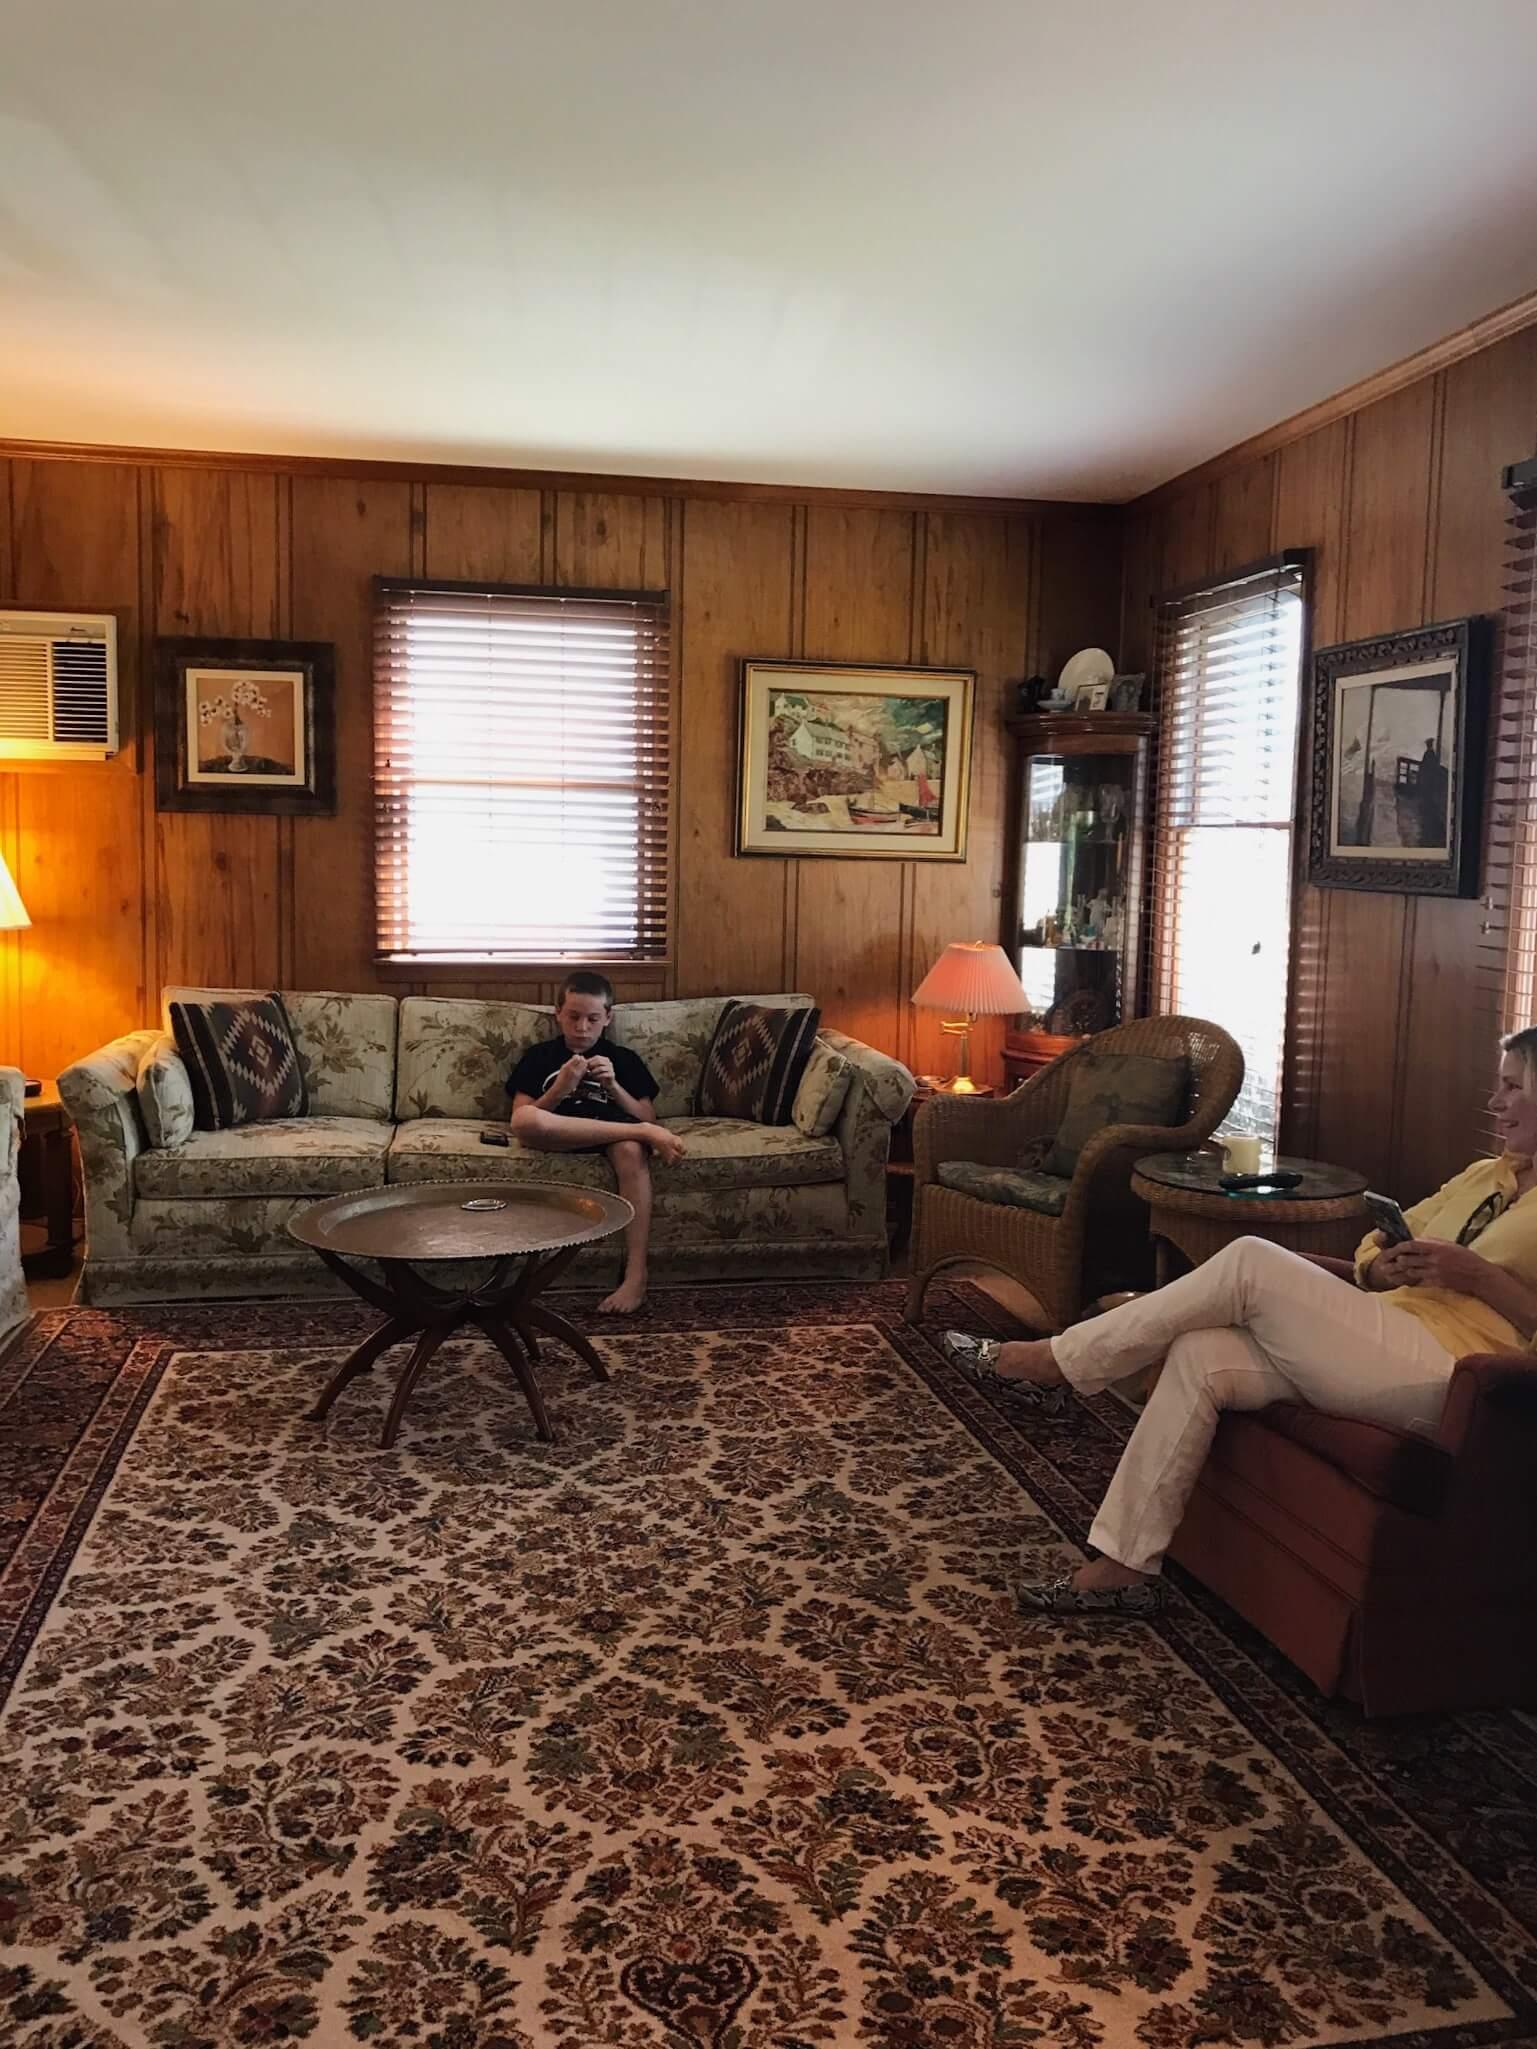 Living Room Before Bbb 1 Marnie Oursler